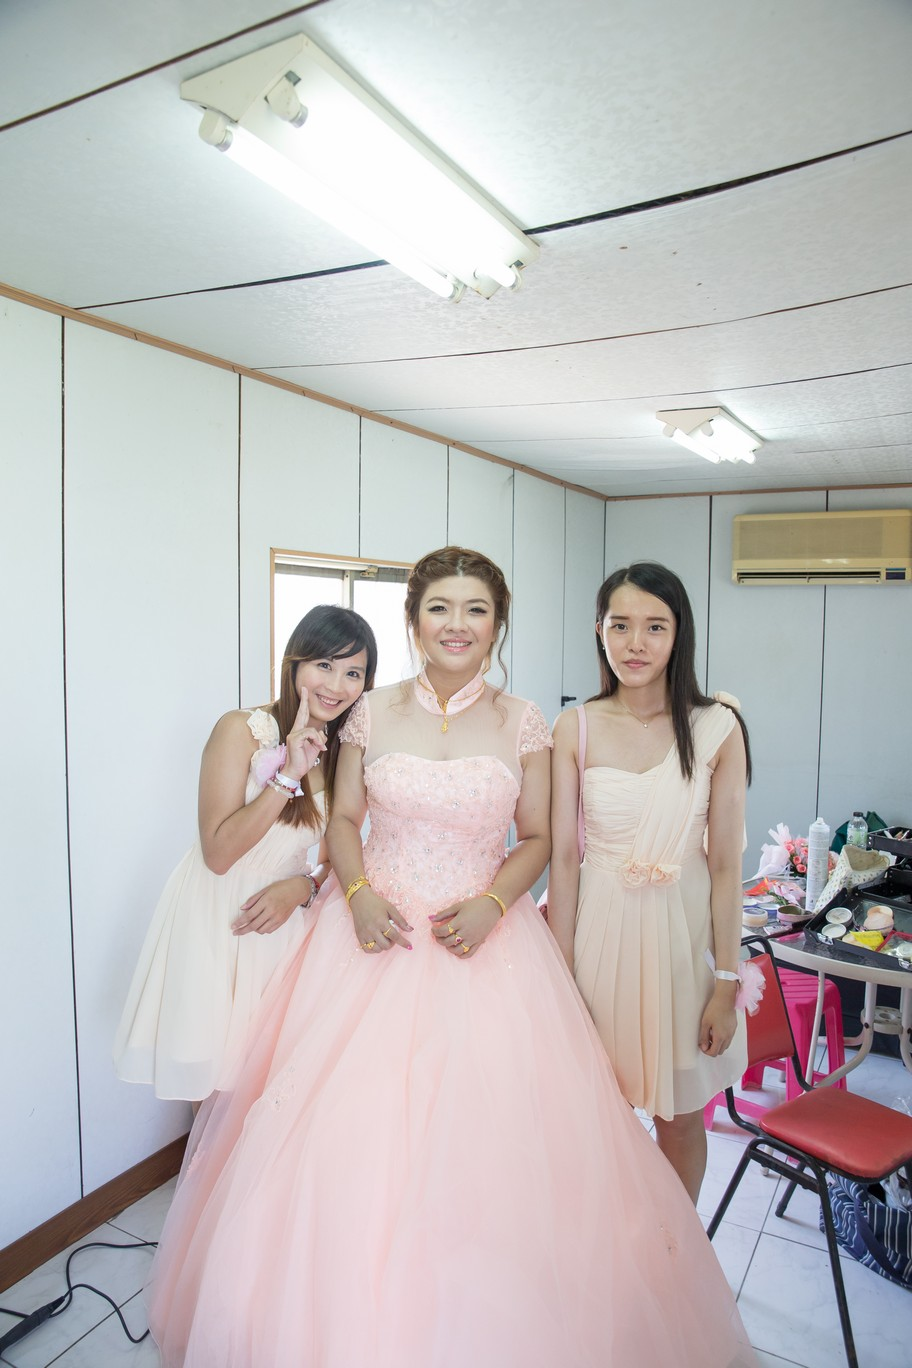 wedding-photo-553 - 桃園婚攝Ume-李優美《結婚吧》